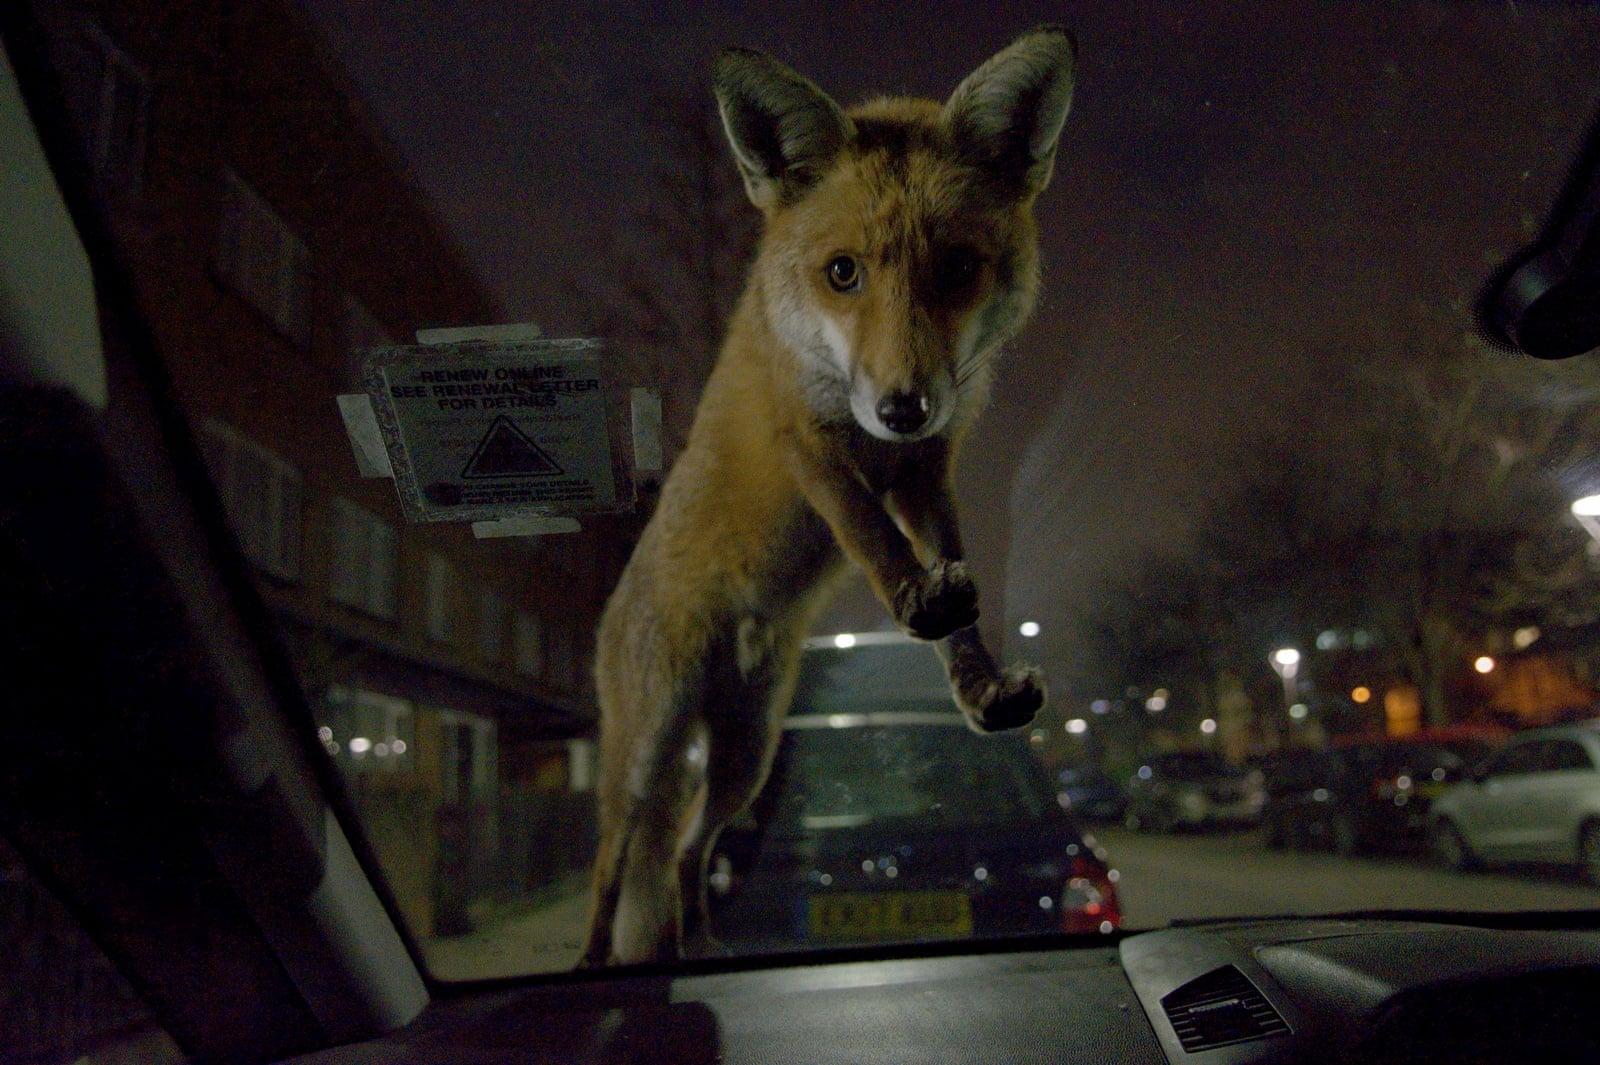 Mammal Photographer of the Year Overall Winner,